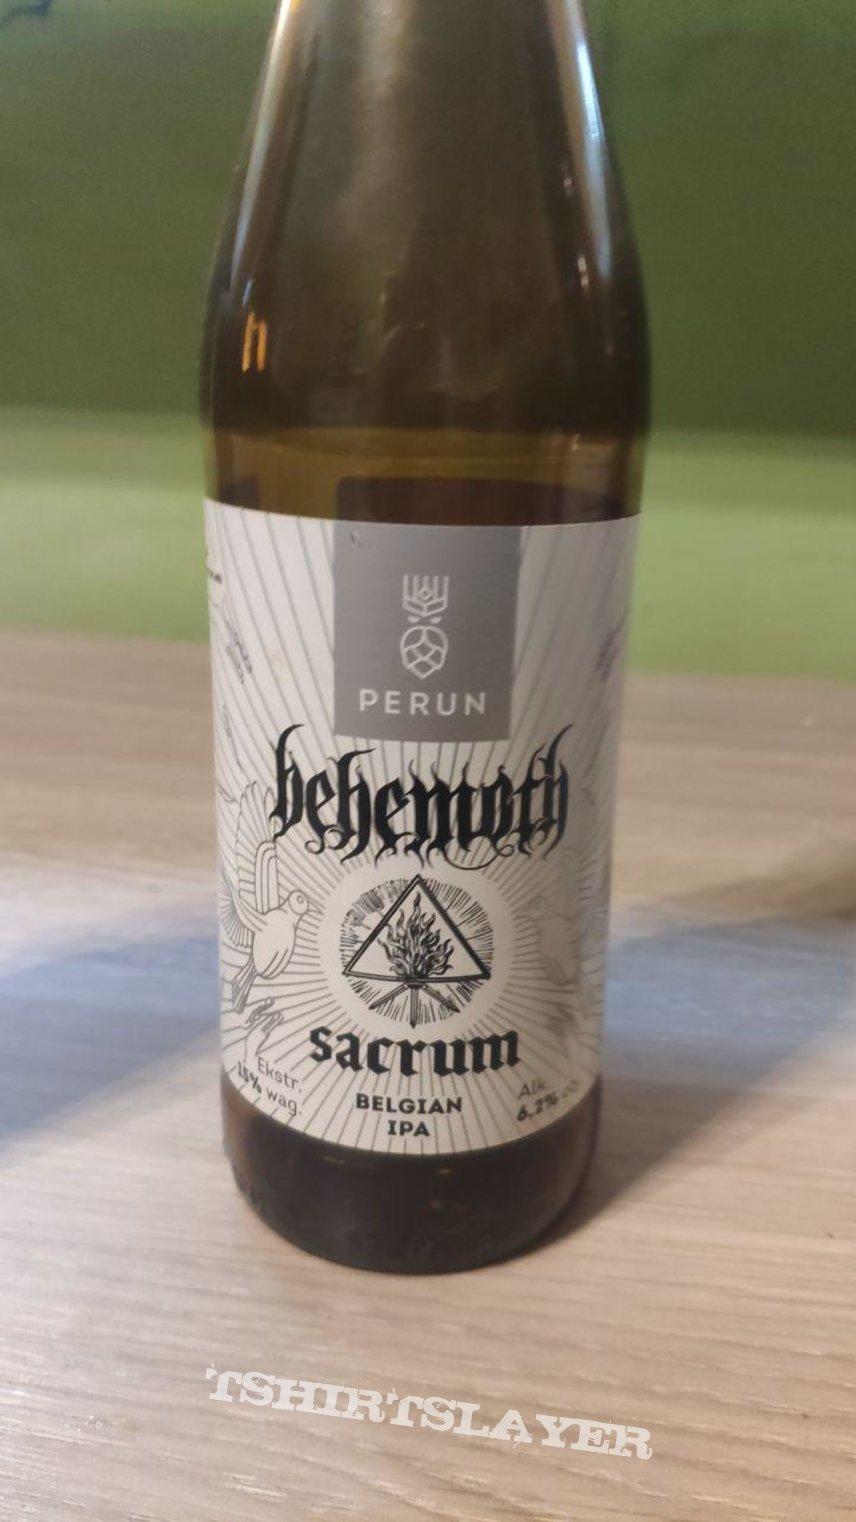 Behemoth - Sacrum (Beer from Browar Perun)